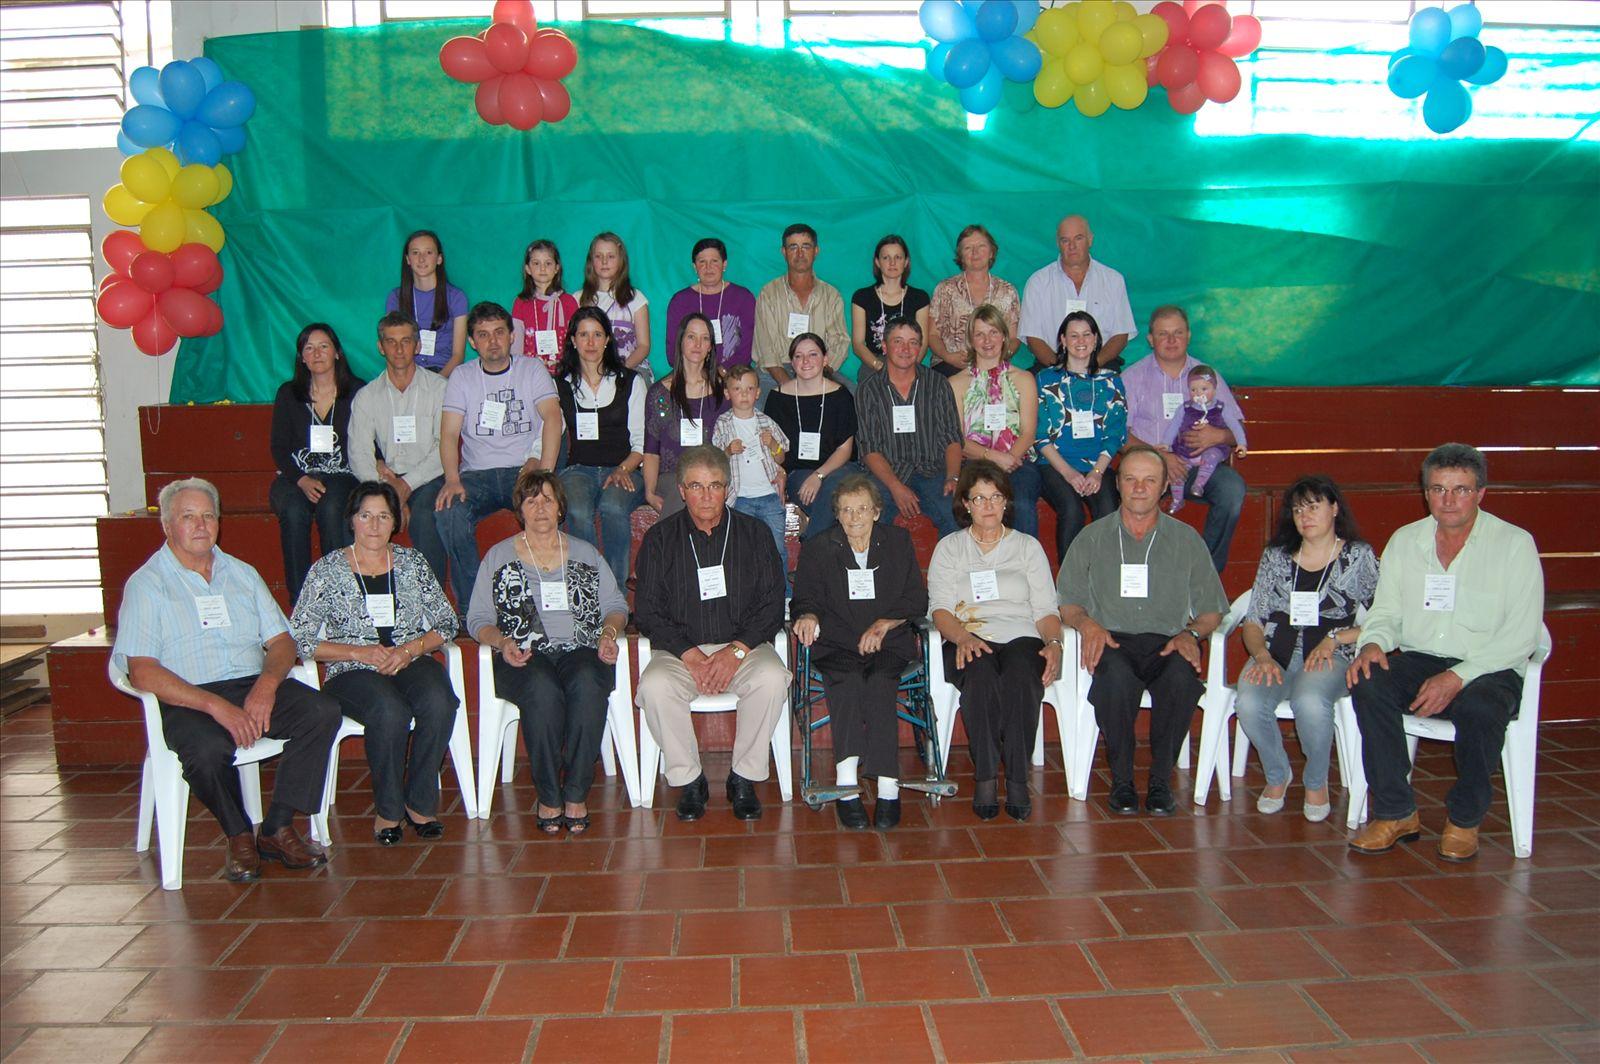 2º Encontro Família Cornelli - 11.10.2009 (174)_0